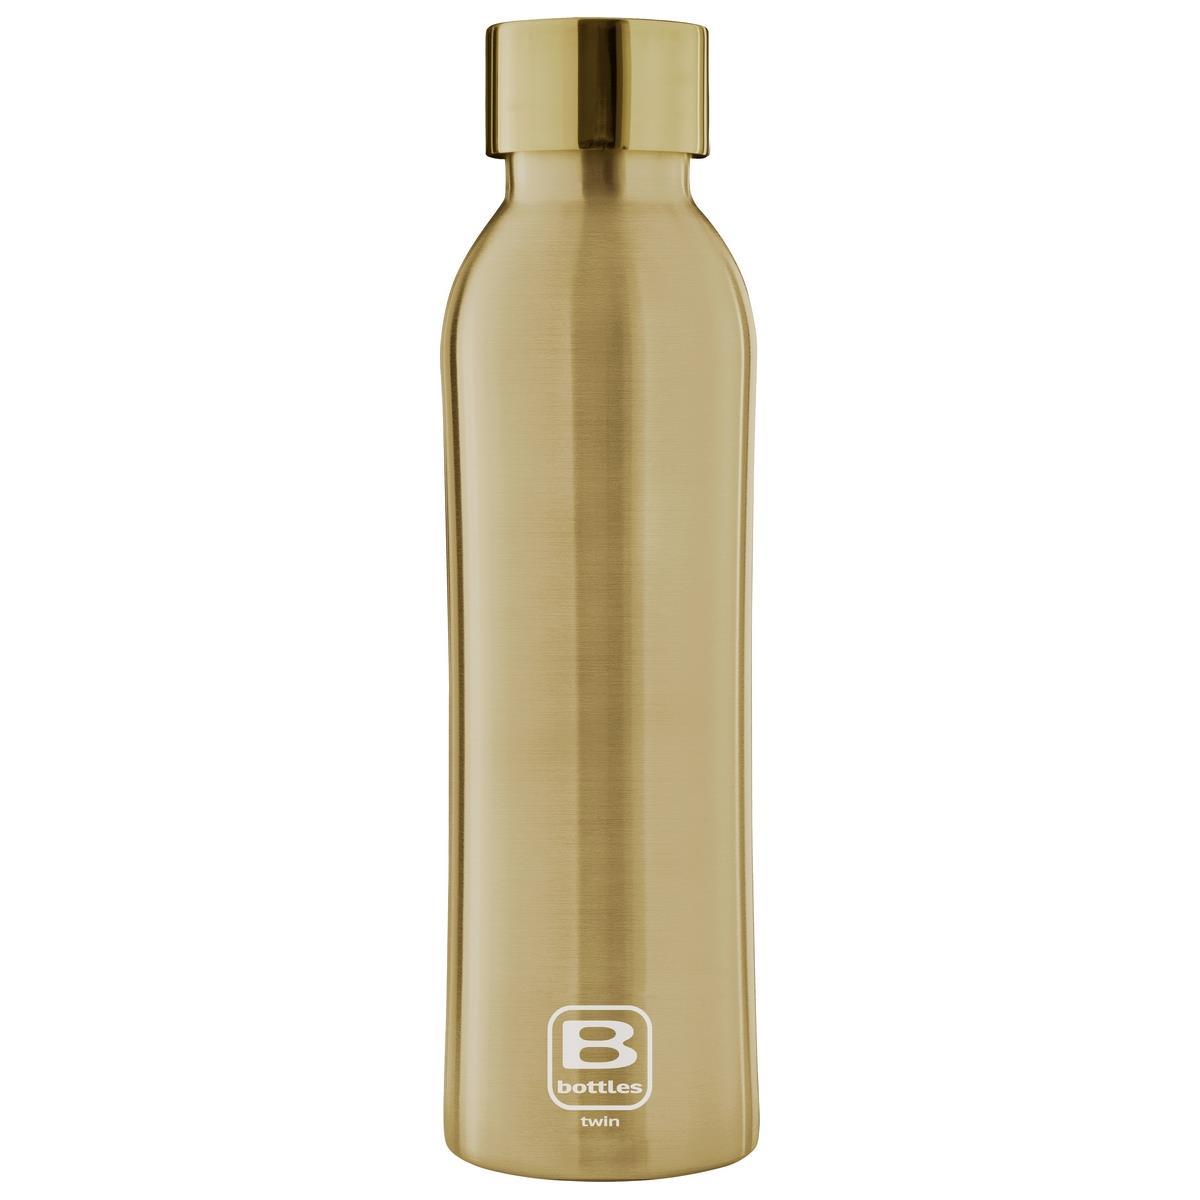 B Bottles Twin - Yellow Gold Brushed - 500 ml - Bottiglia Termica doppia parete in acc. inox 18/10